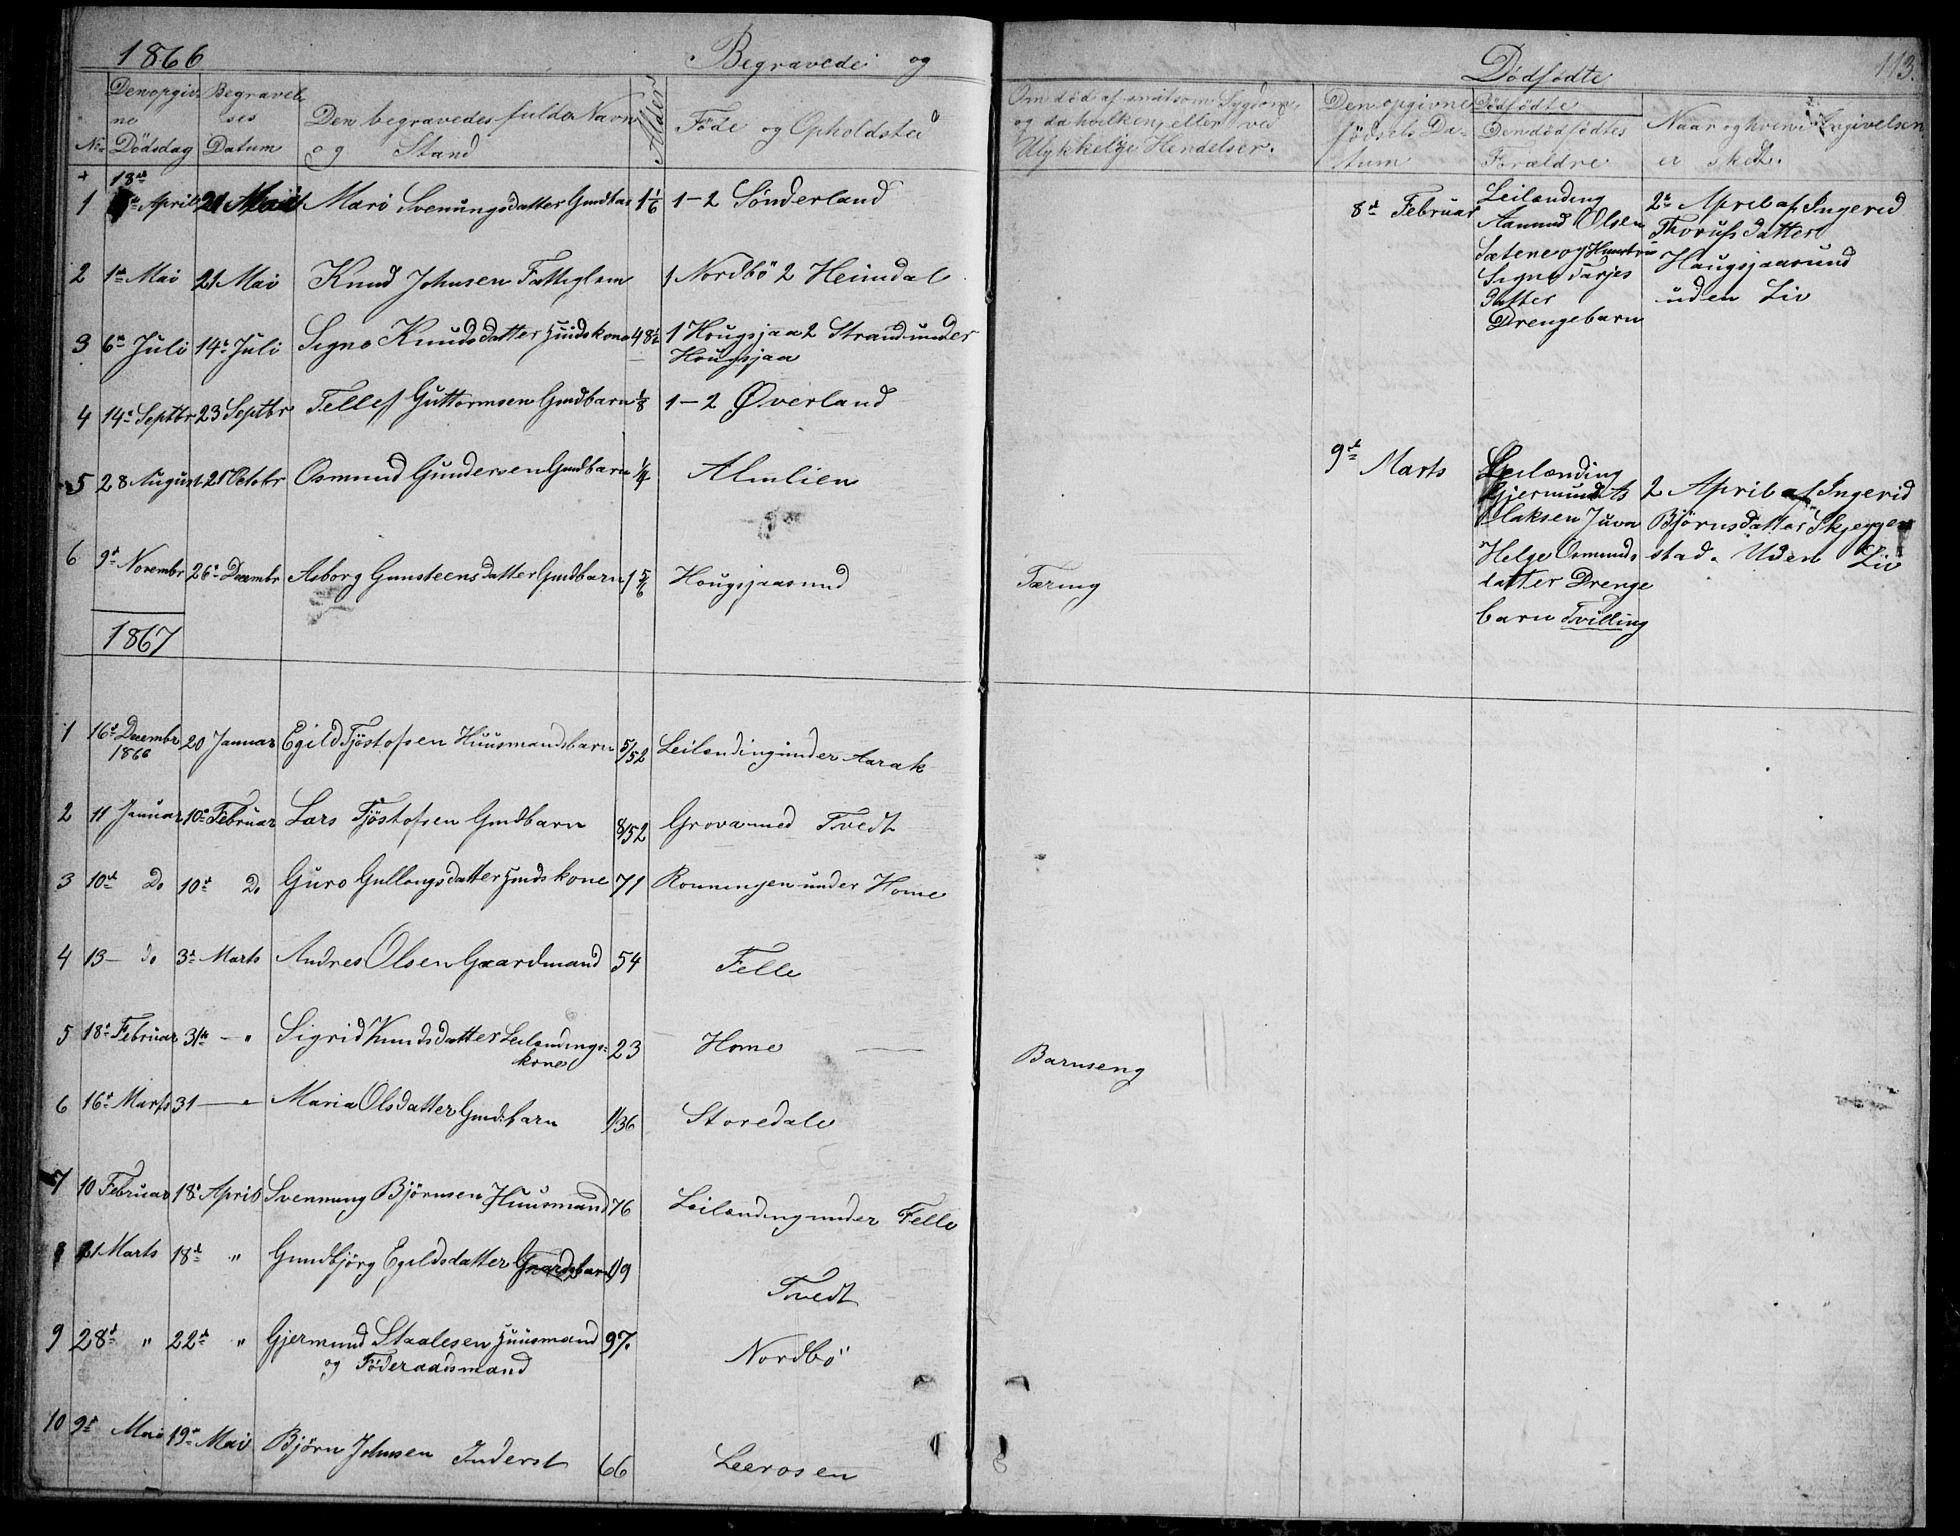 SAKO, Nissedal kirkebøker, G/Gb/L0002: Klokkerbok nr. II 2, 1863-1892, s. 113